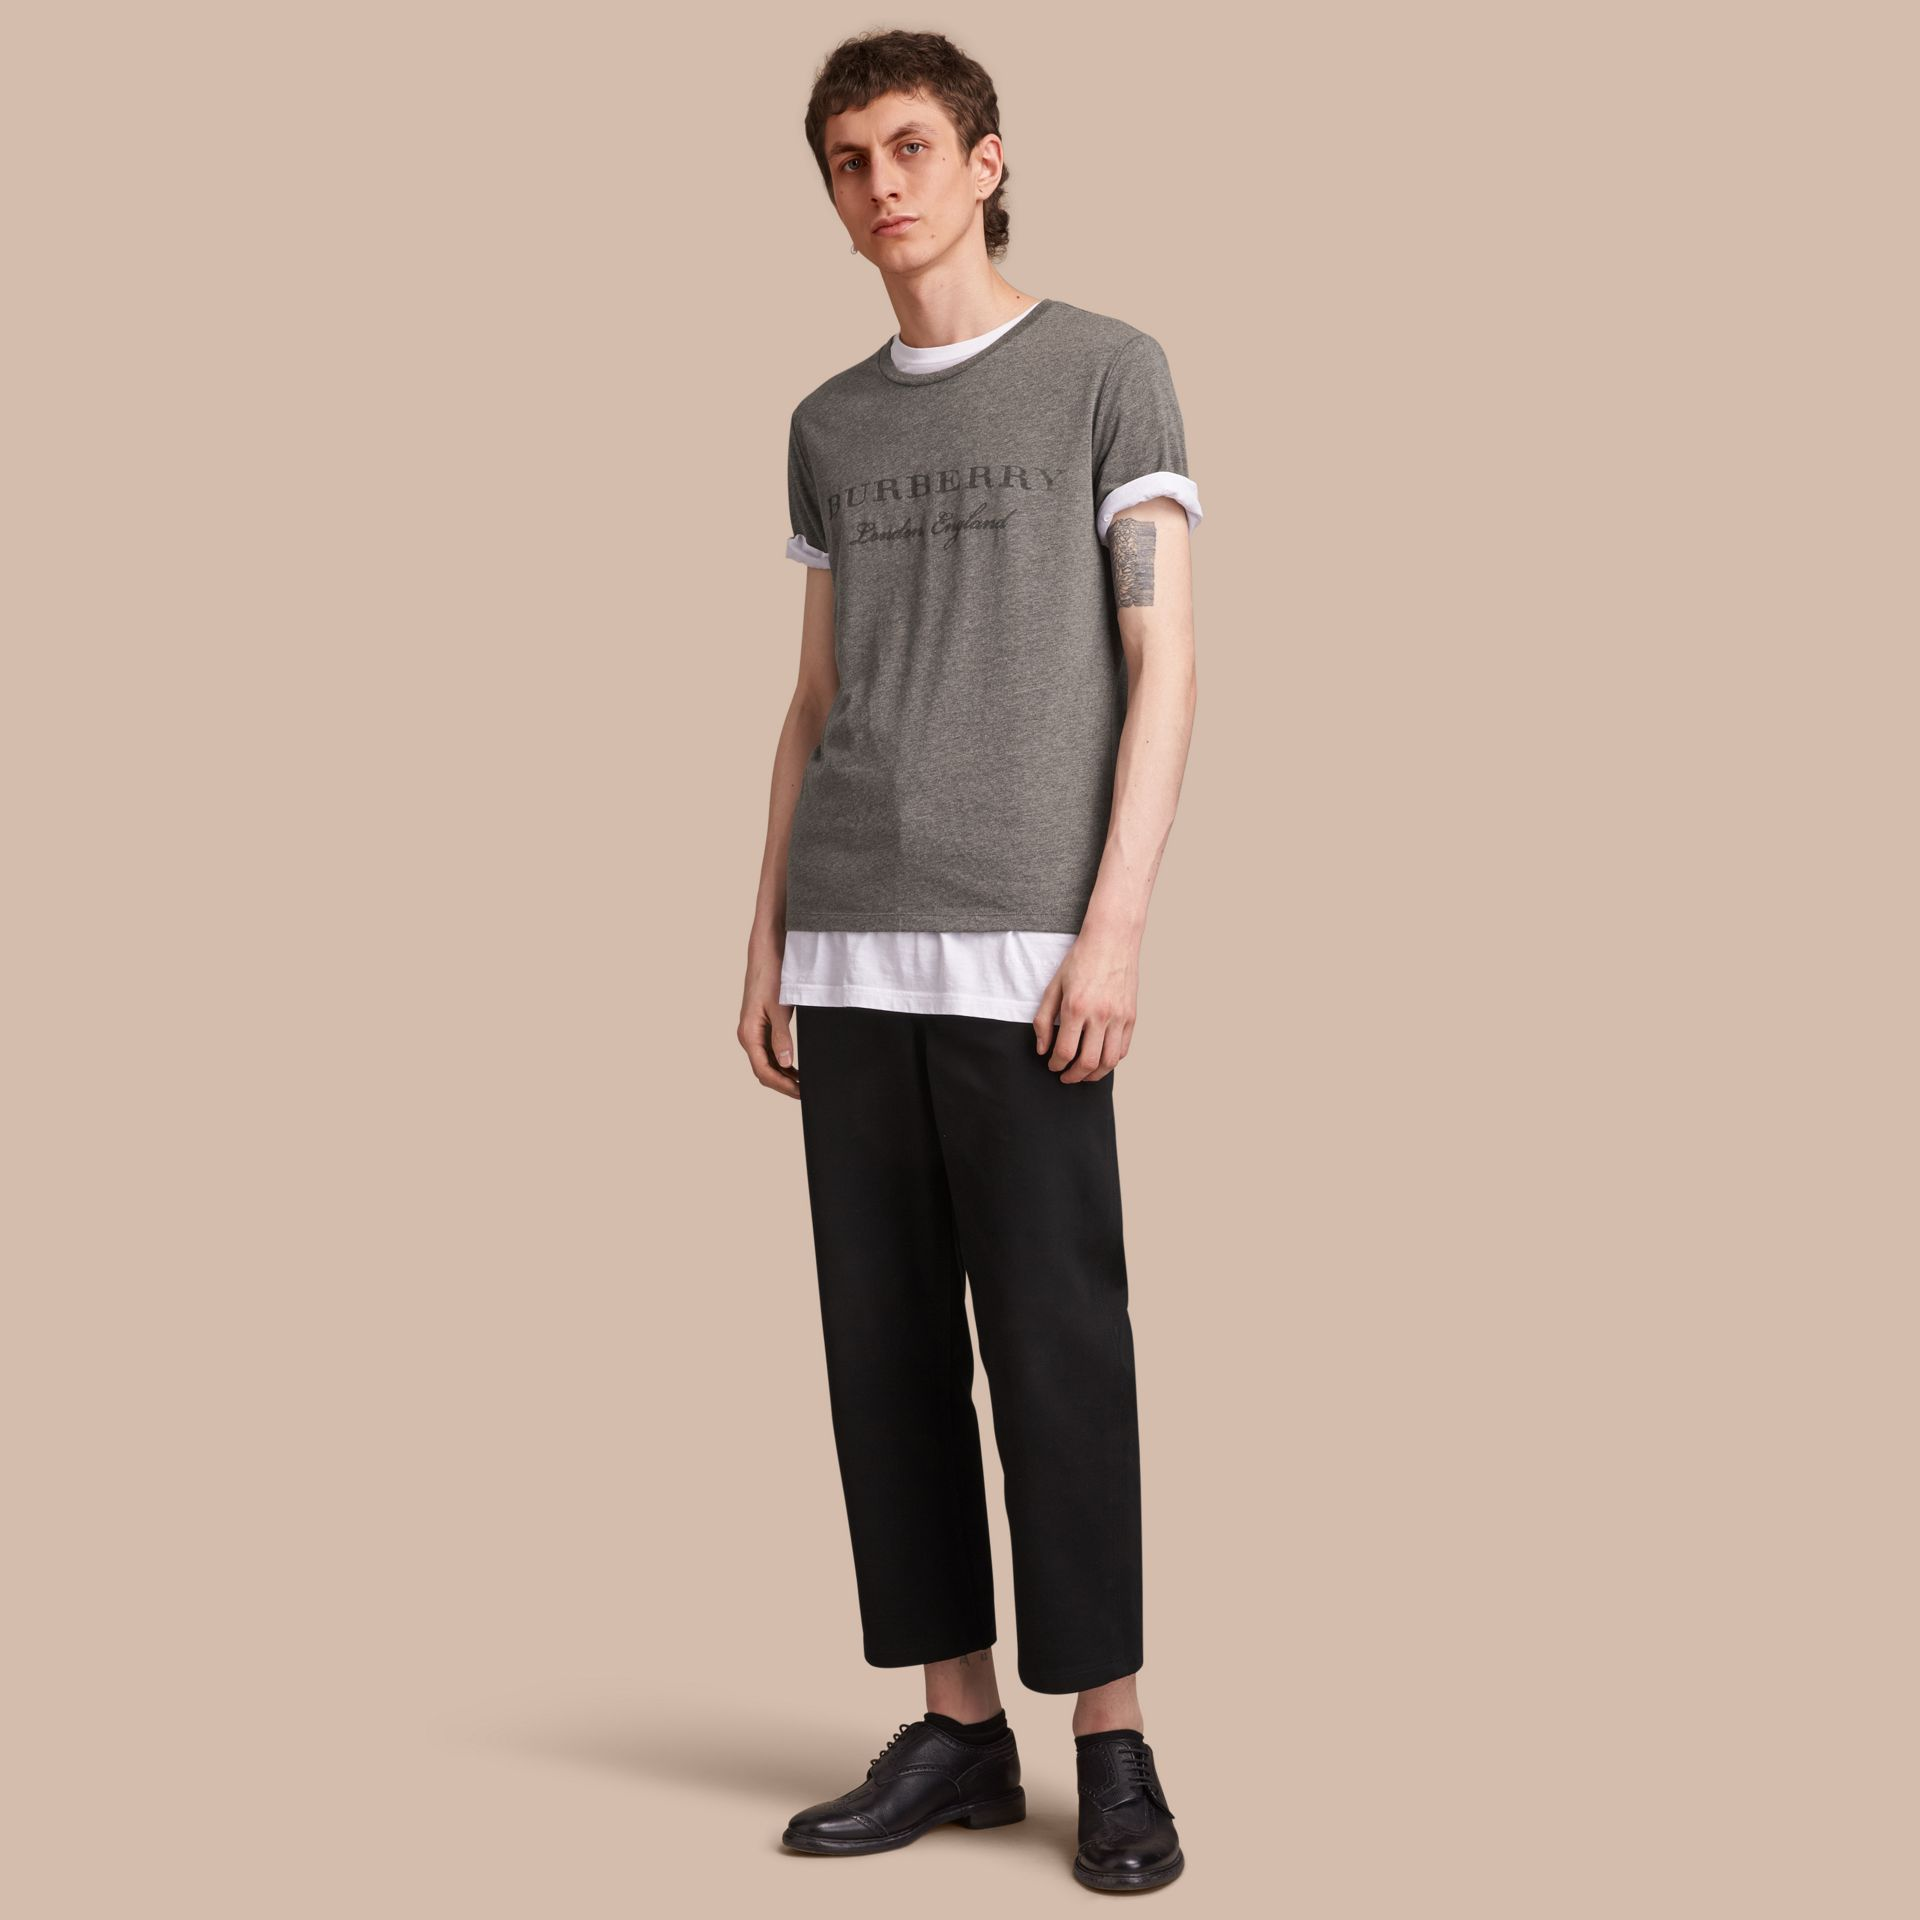 Devoré Cotton Jersey T-shirt in Mid Grey Melange - gallery image 1